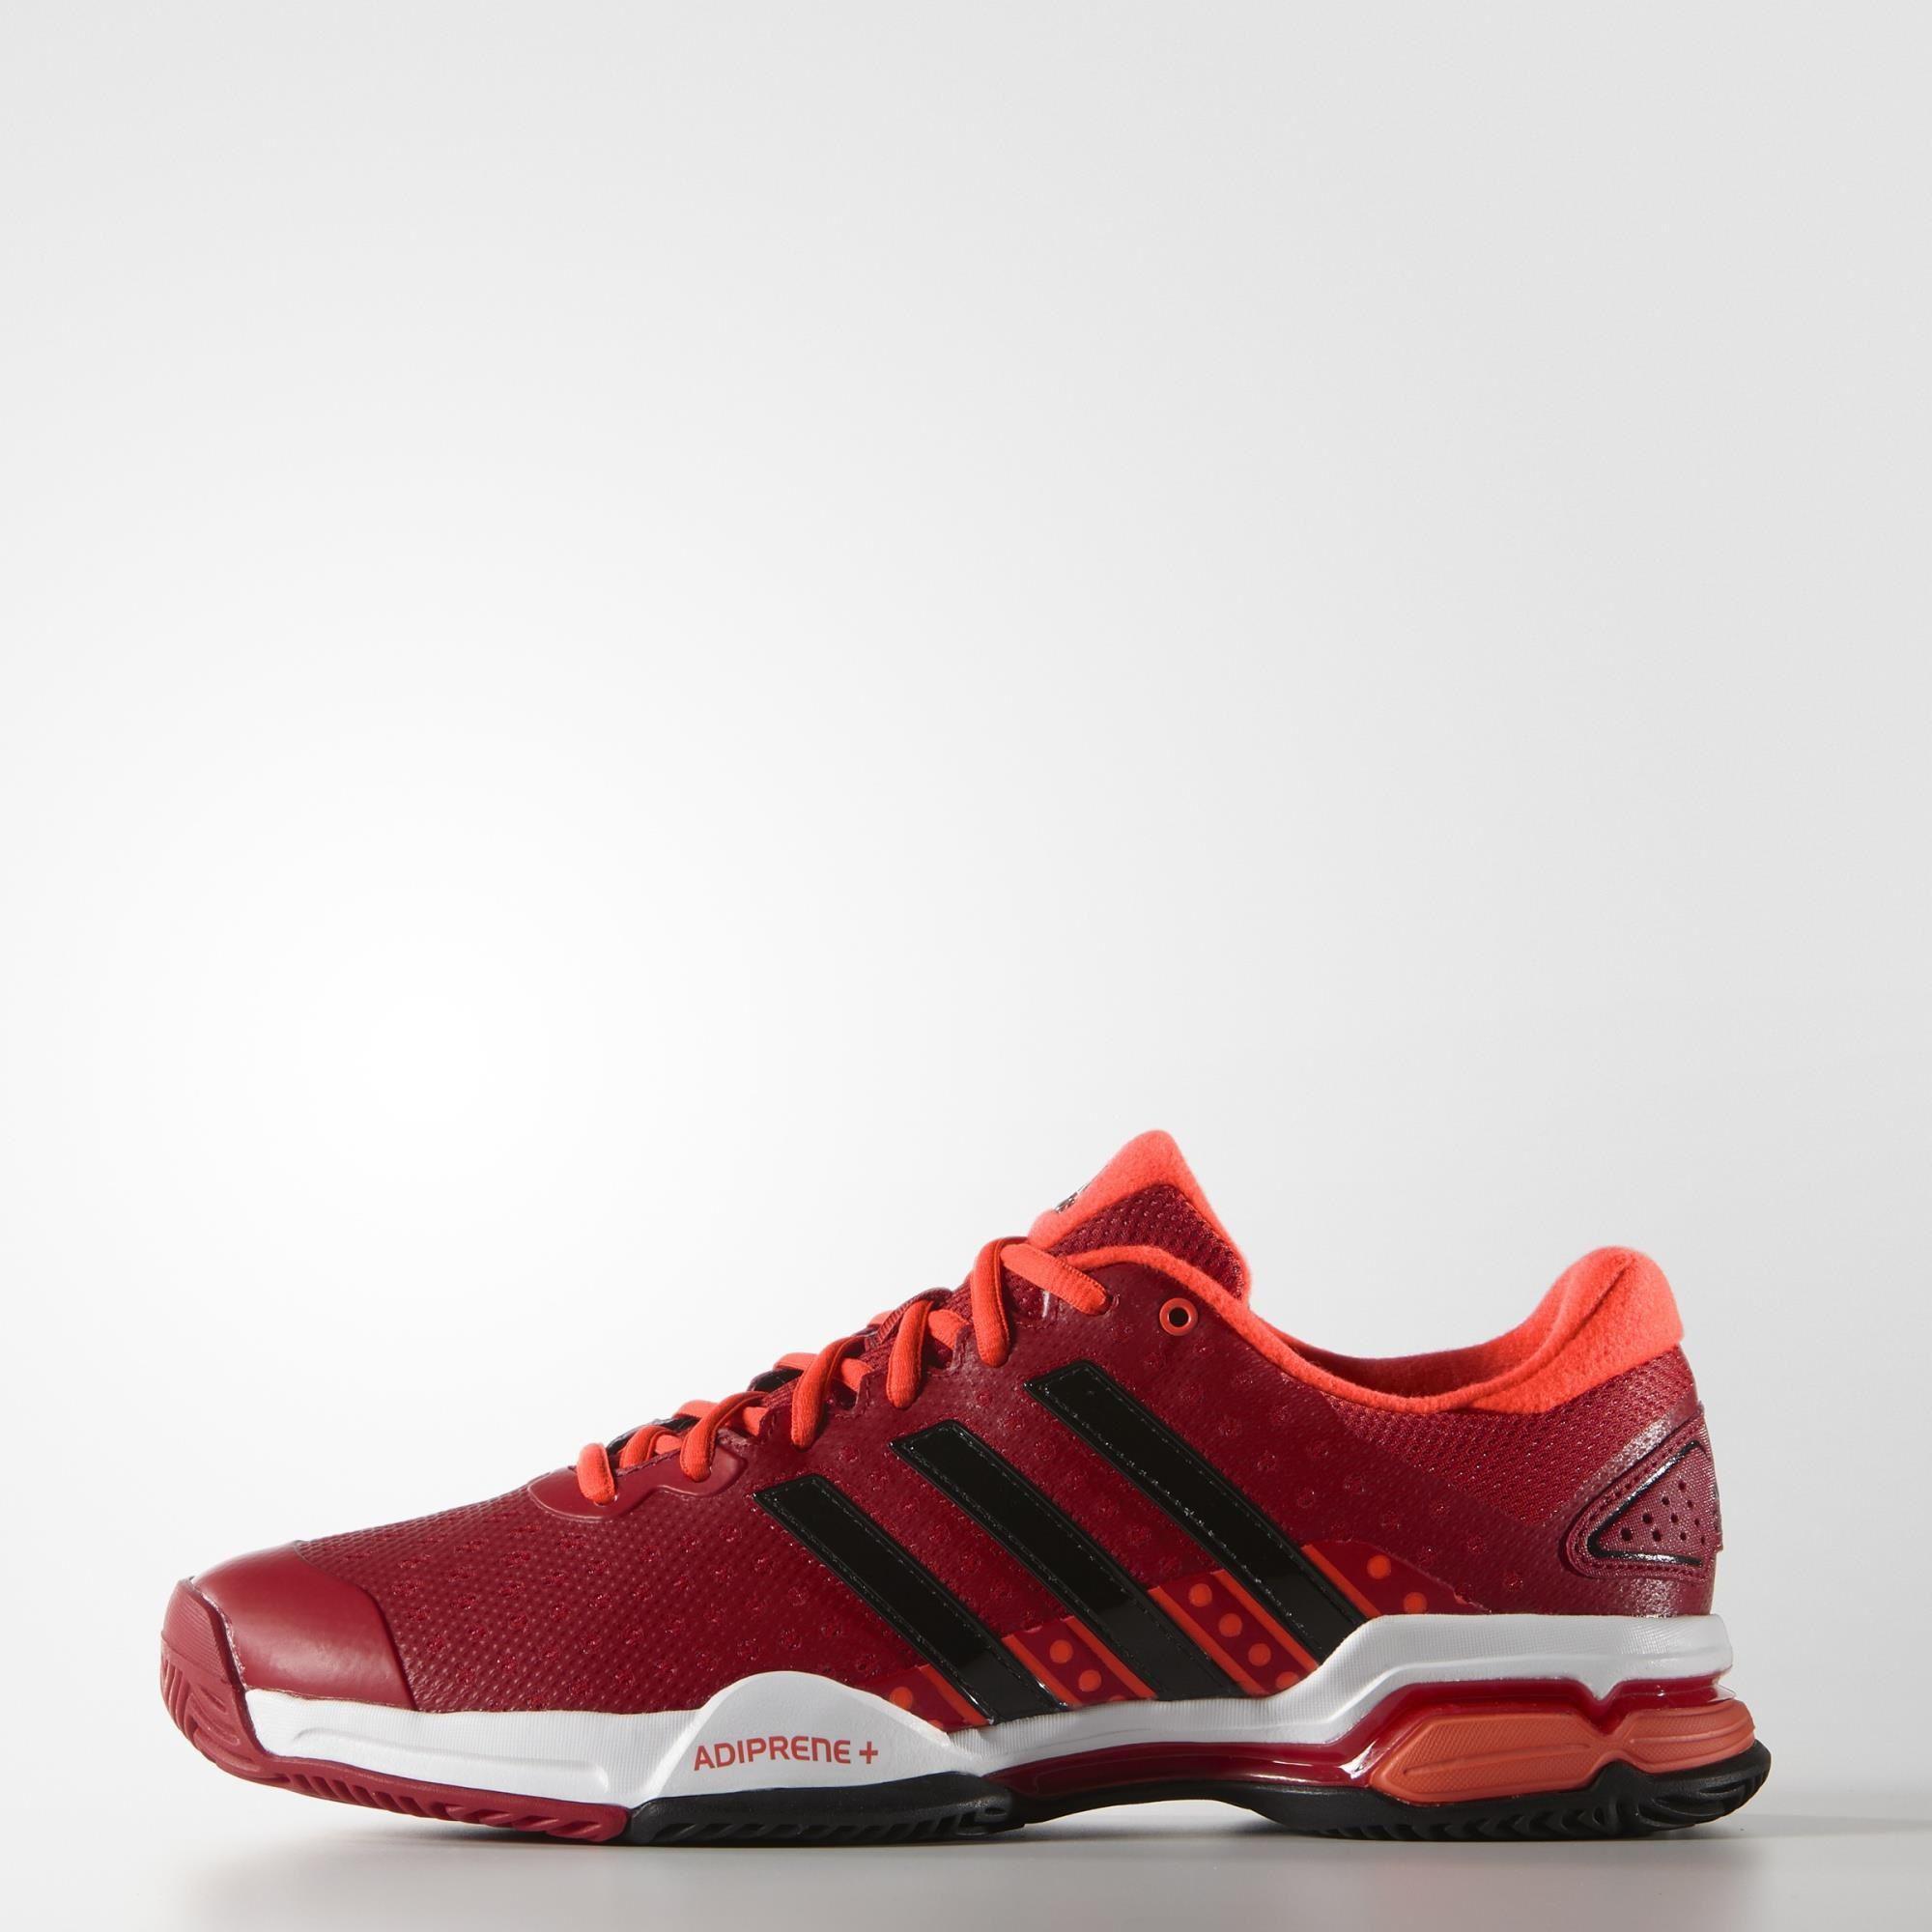 Adidas Mens Barricade Team 4 Tennis Shoes - Power Red/Black